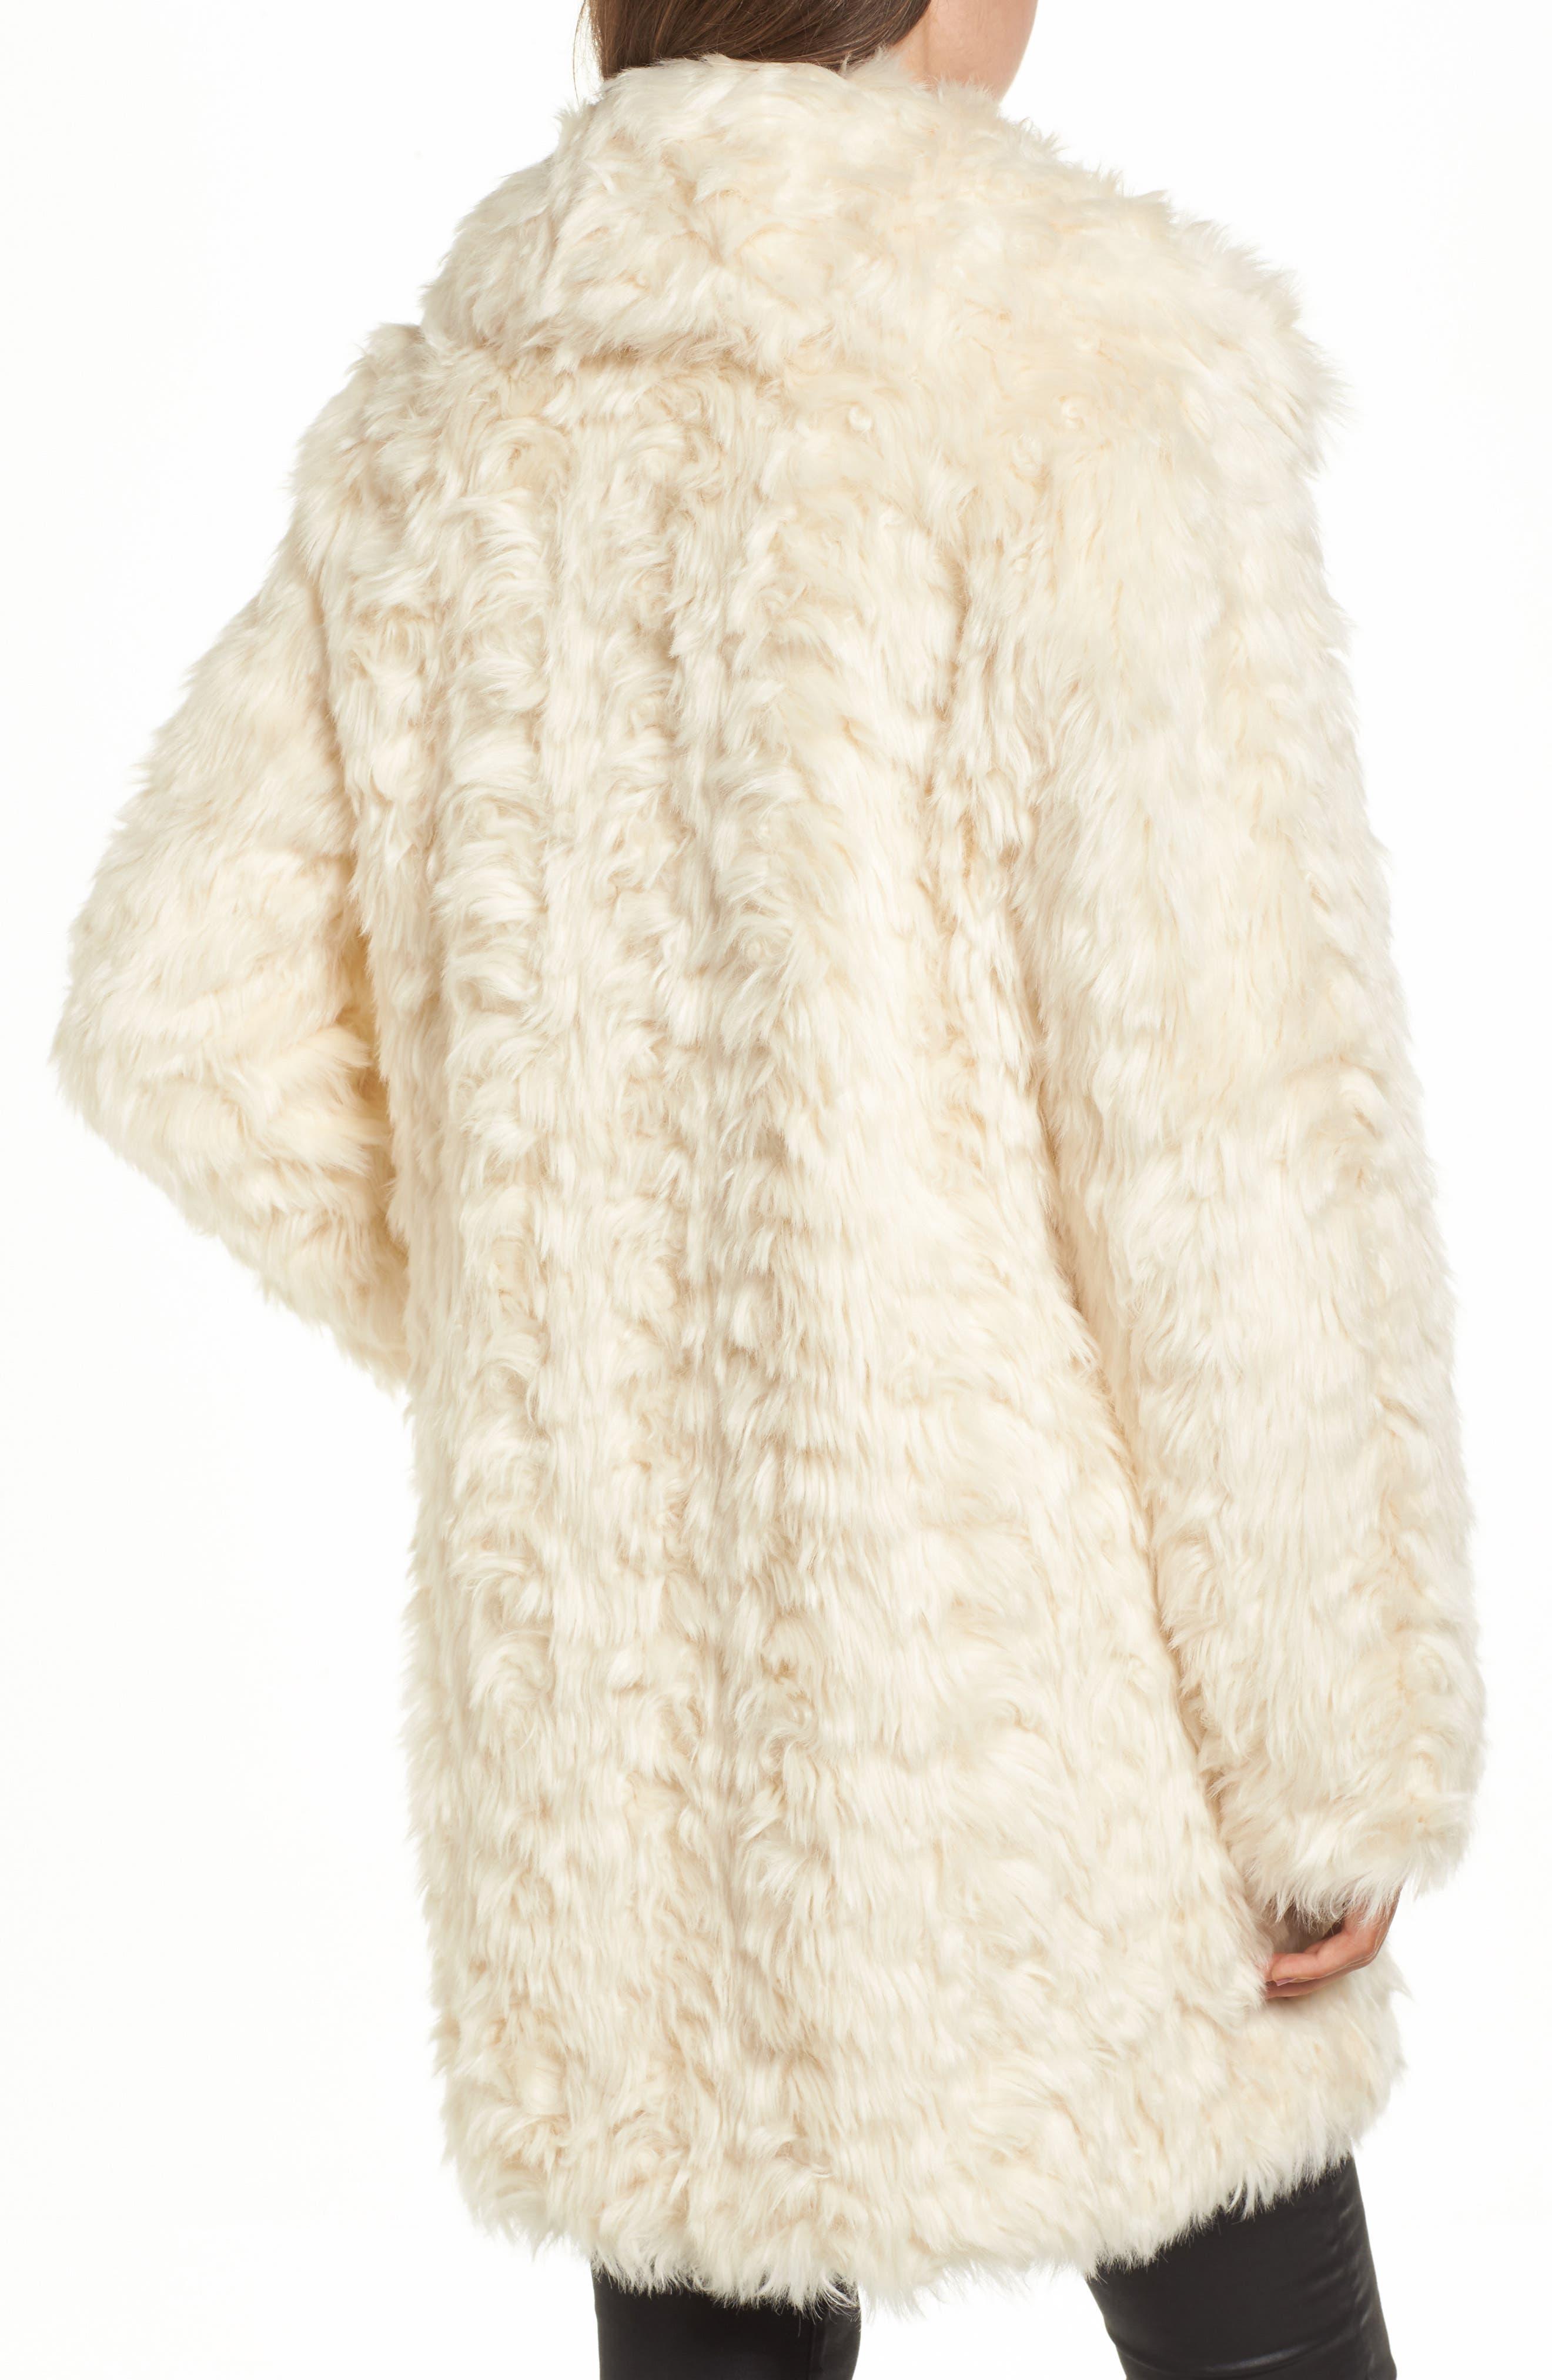 Curly Faux Fur Coat,                             Alternate thumbnail 2, color,                             Ivory